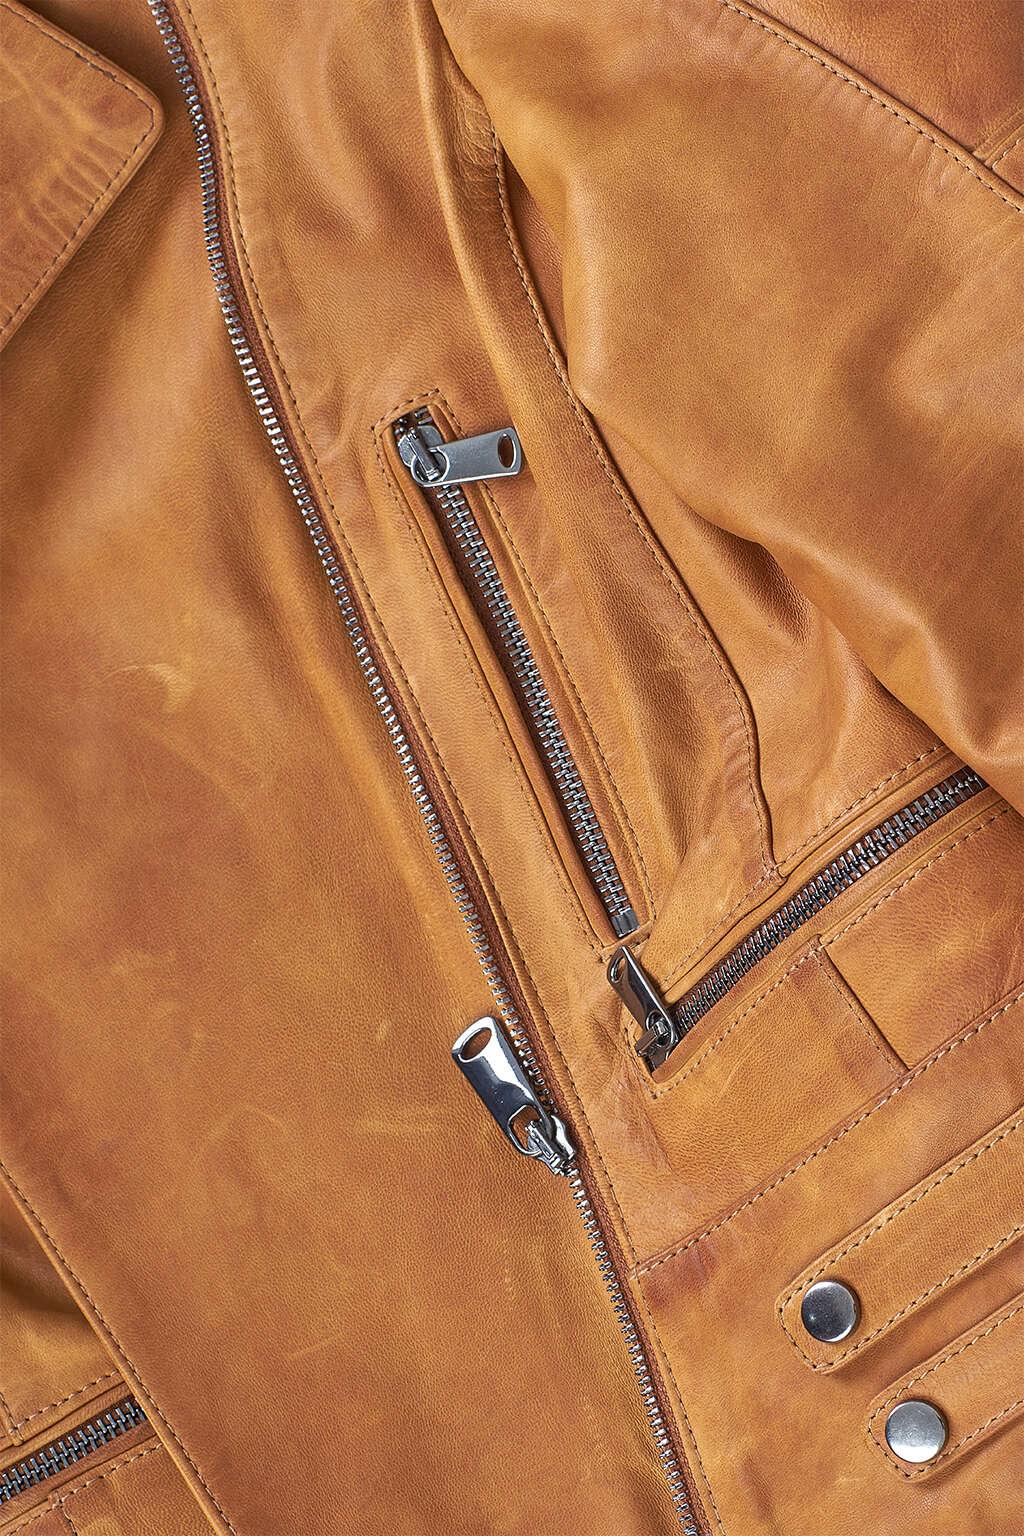 Zipper Detail of Tawny Brown Classic Biker Leather Jacket